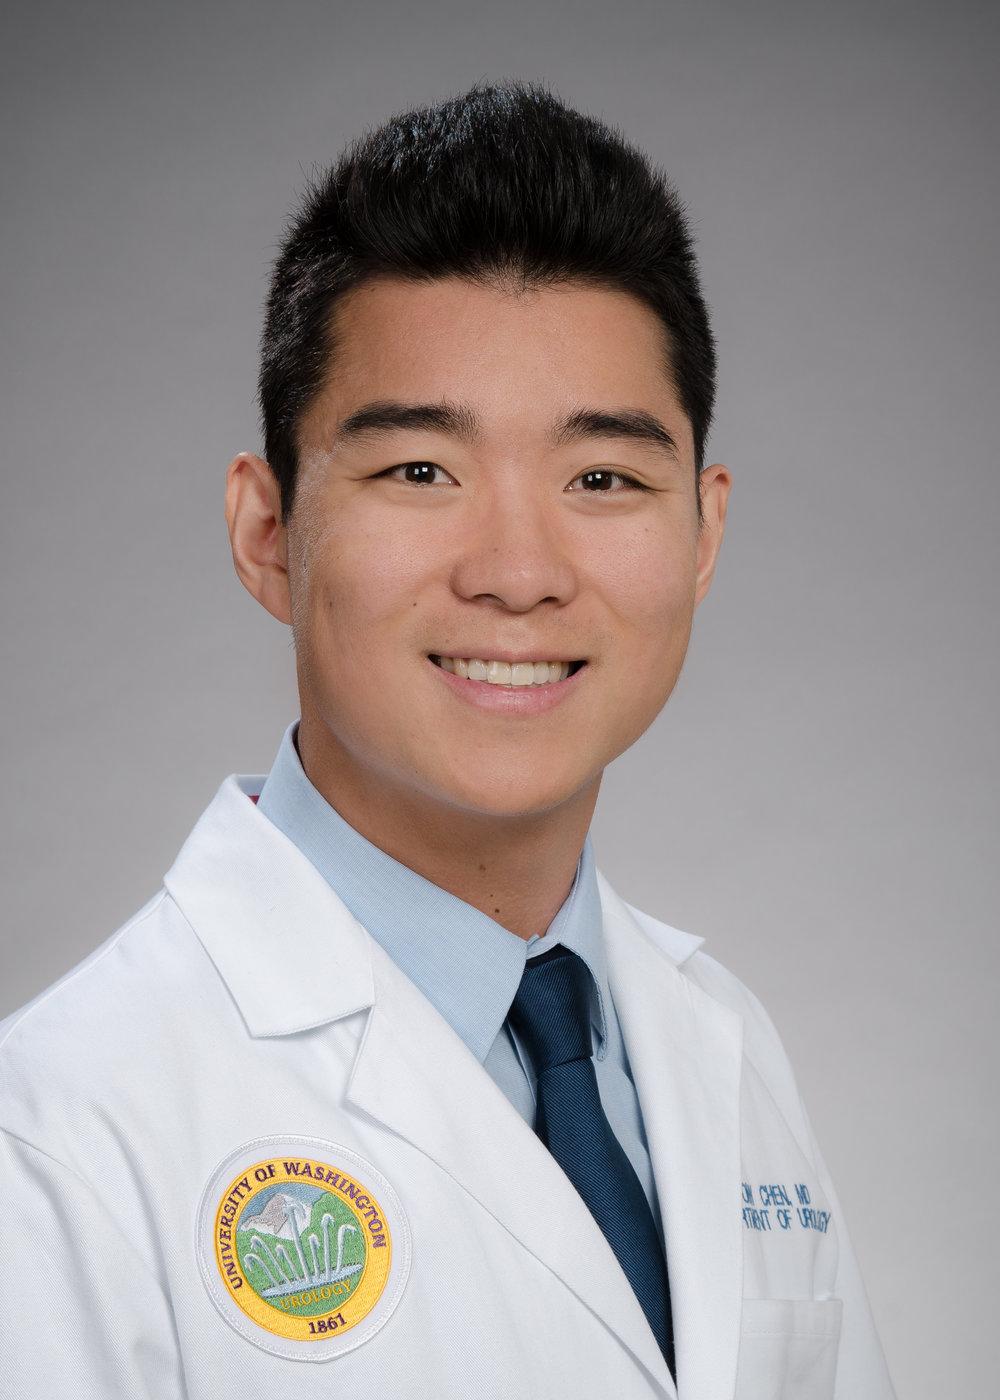 Tony Chen, M.D.